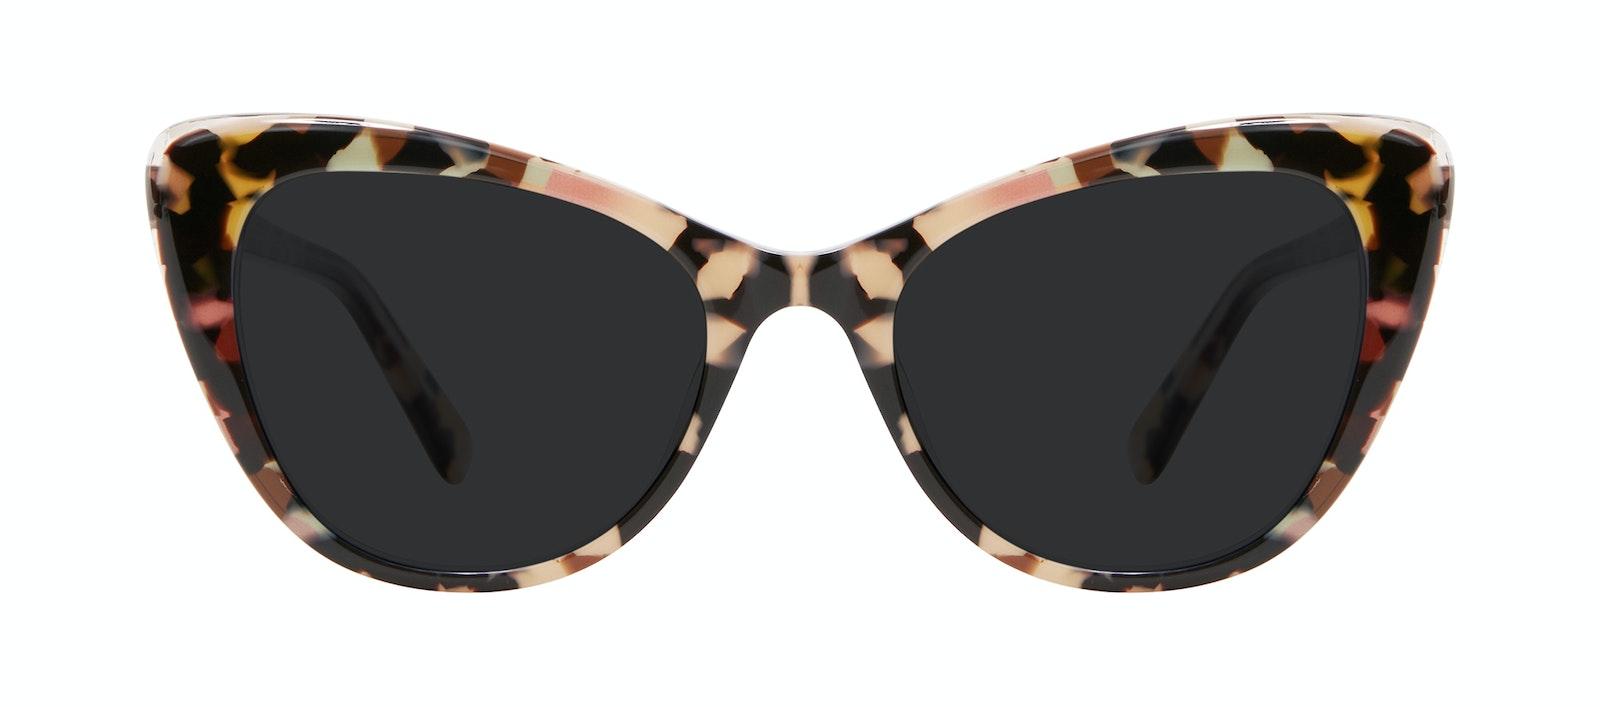 Affordable Fashion Glasses Cat Eye Sunglasses Women Verve Pastel Tort Front